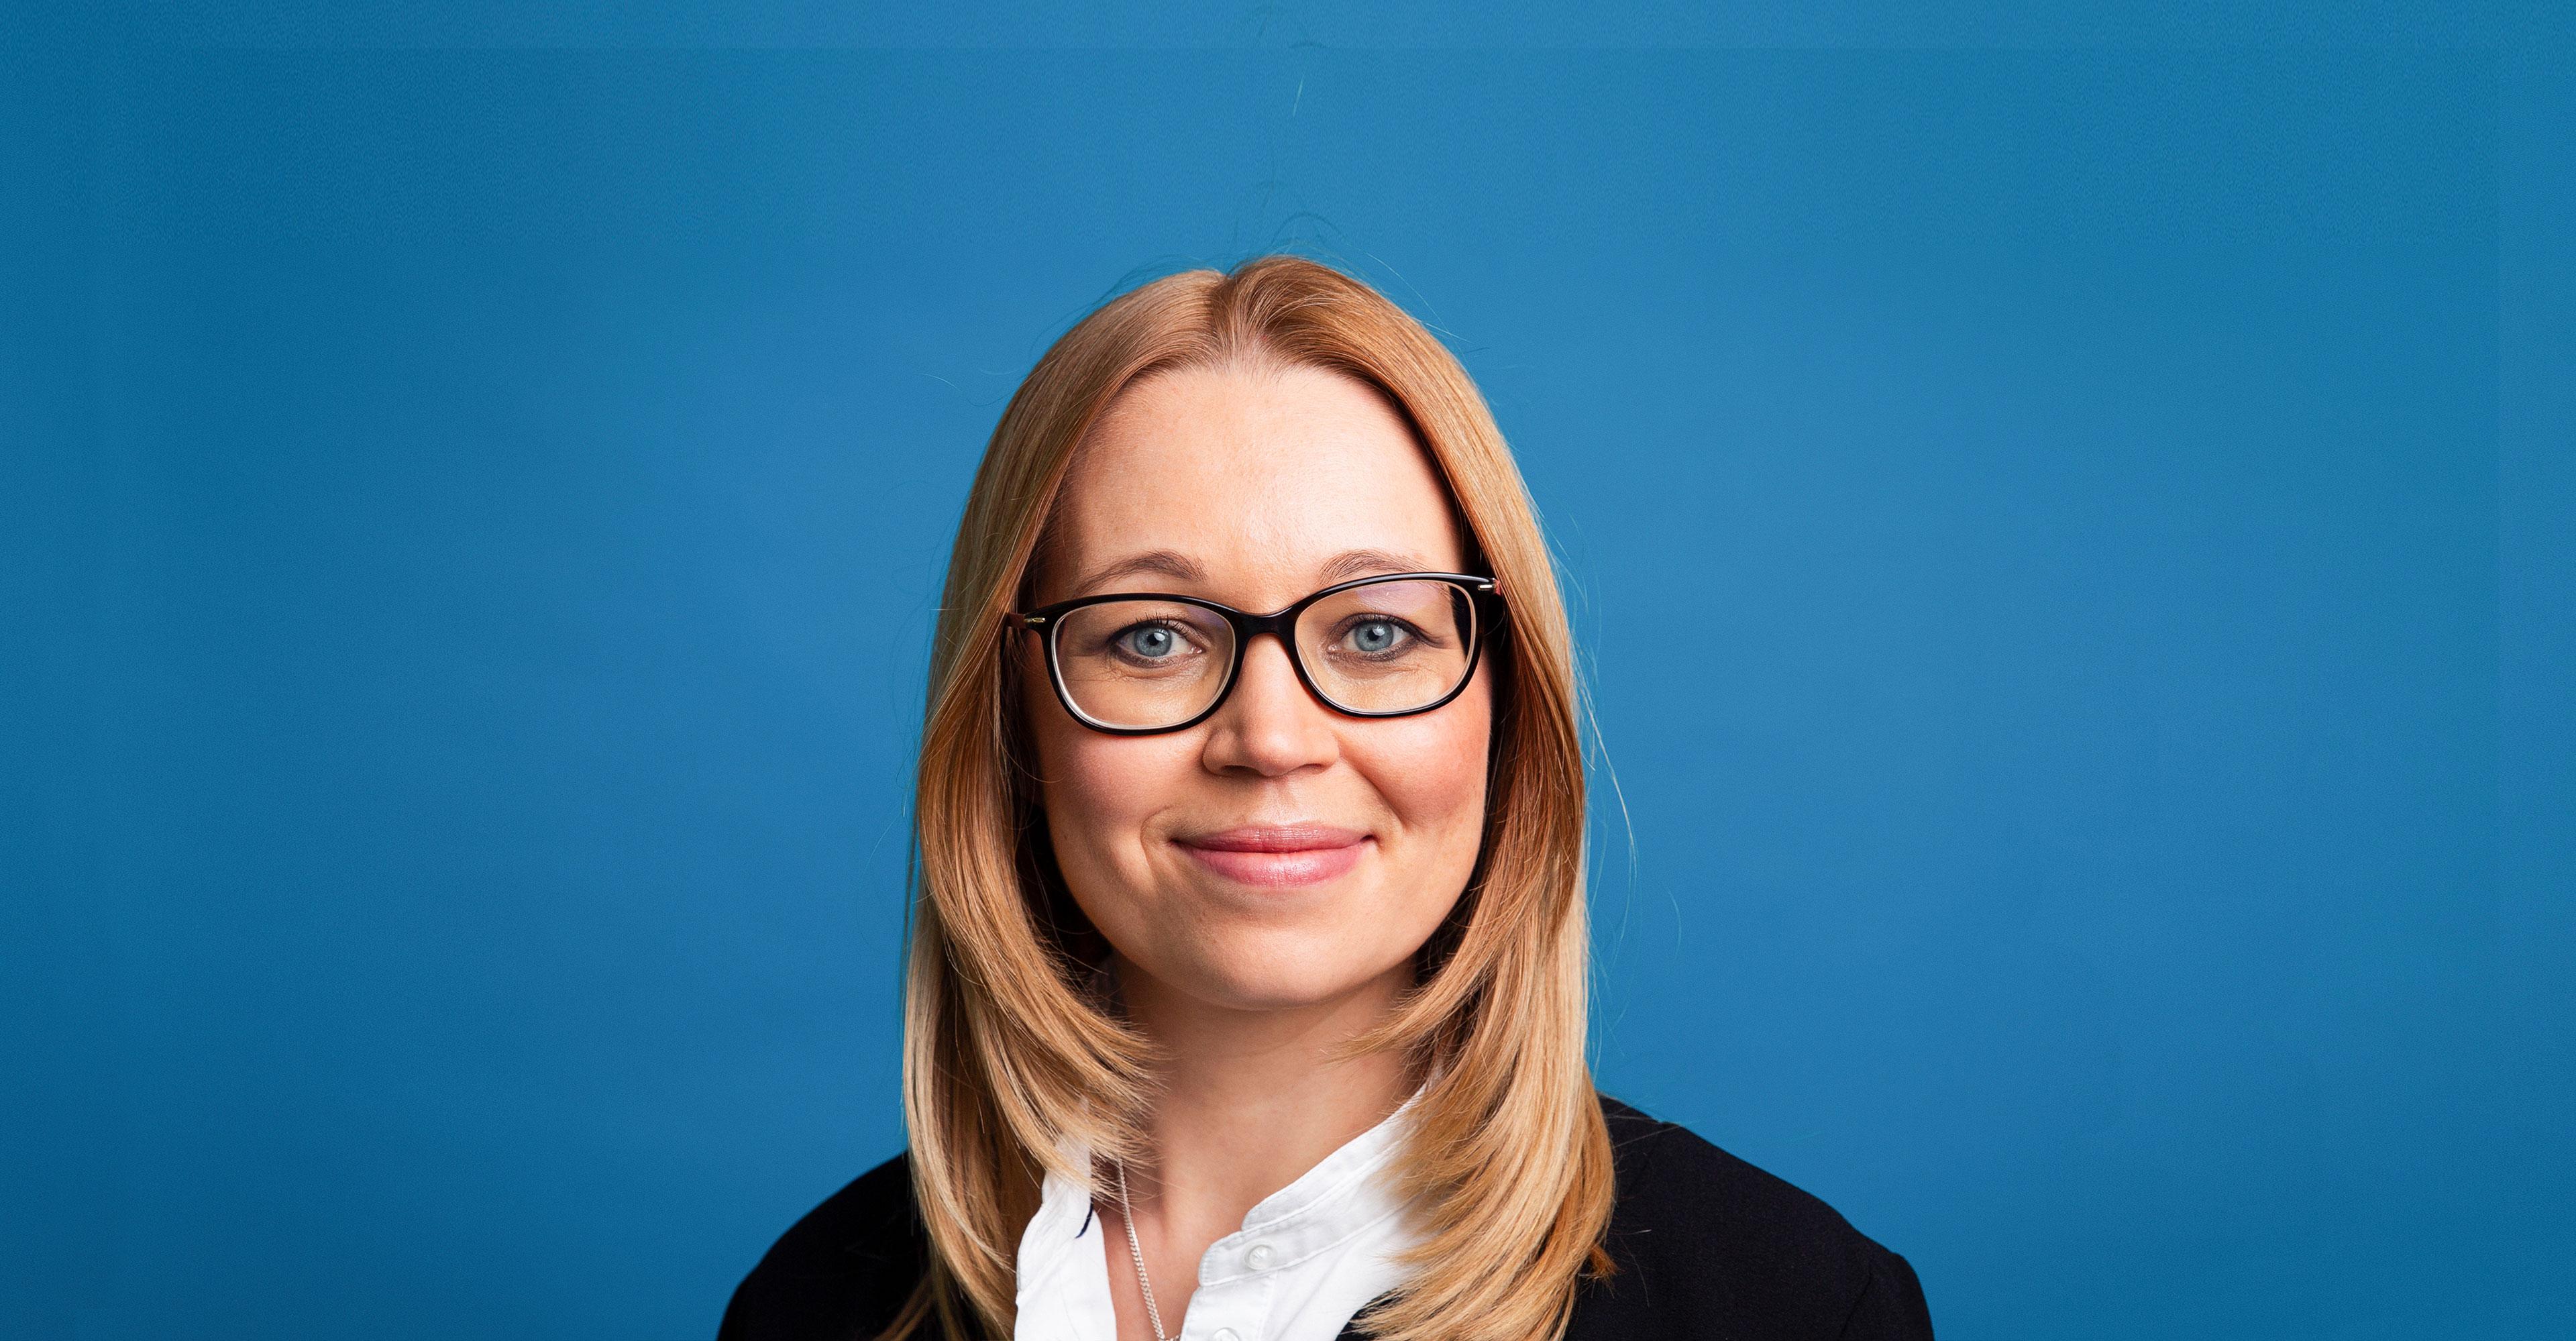 Rechtsanwältin Steuerberaterin Svetlana Heil